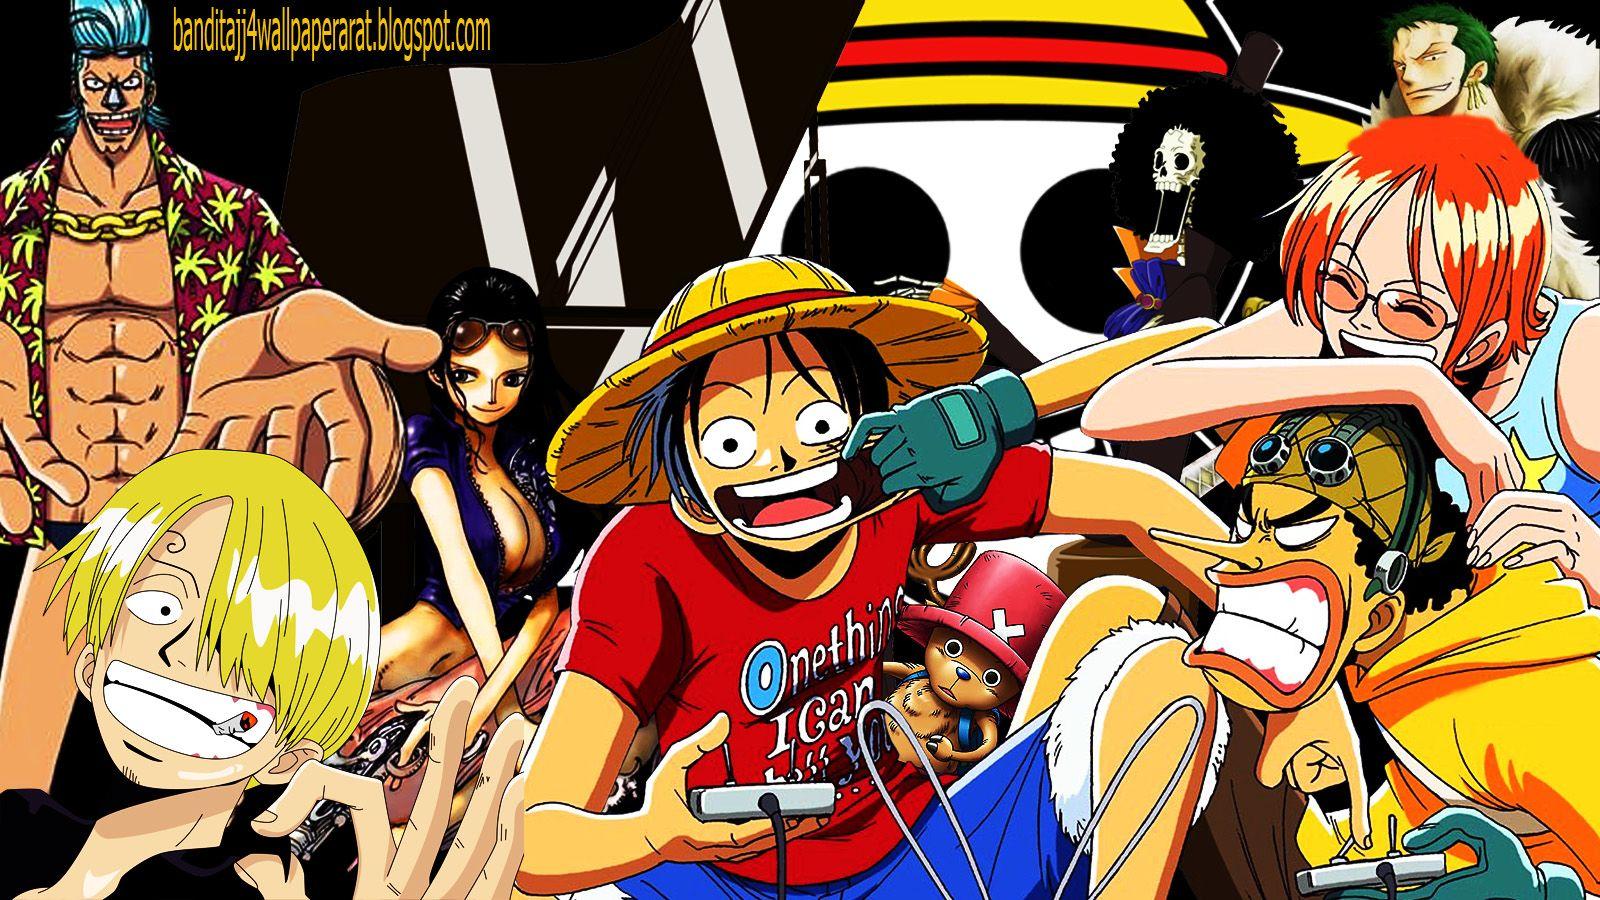 Download Wallpaper One Piece Hd Untuk Android Download Gambar Wallpaper One Piece Kumpulan Wallpaper Do In 2020 Hd Anime Wallpapers World Wallpaper One Piece Cartoon